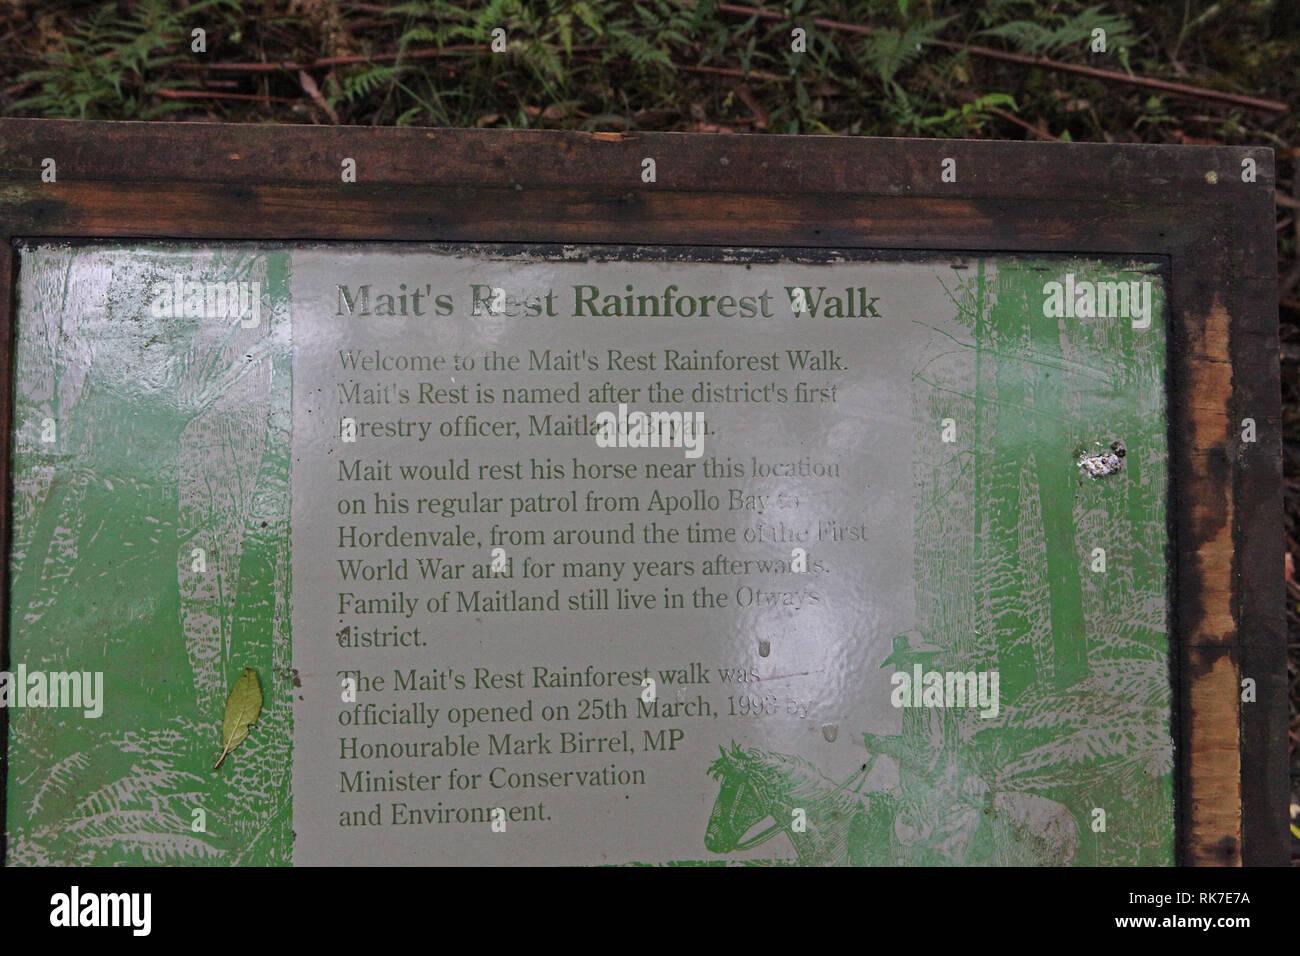 Visit Australia.  Mait's Rainforest Walk. - Stock Image